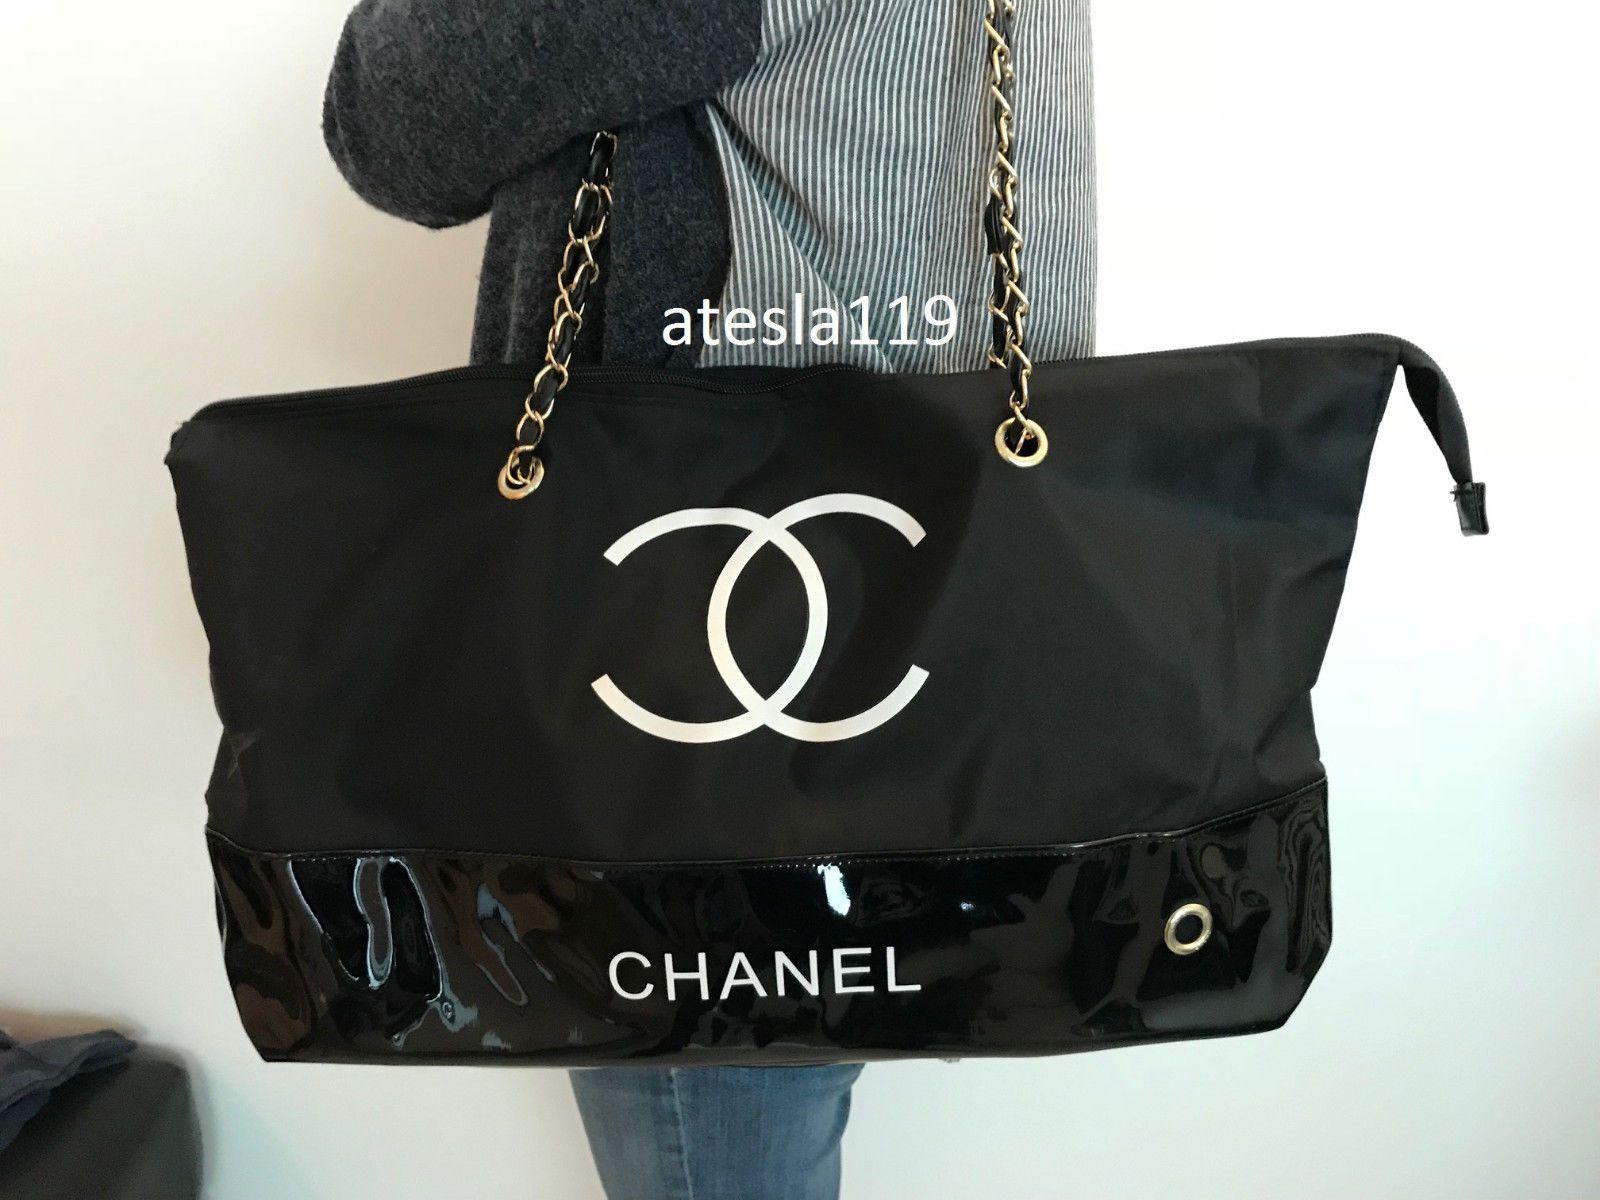 38fde1dc290eb1 Chanel VIP Gift Black Nylon Tote Bag Shopping Travel Shopper Leather Gold  Chain